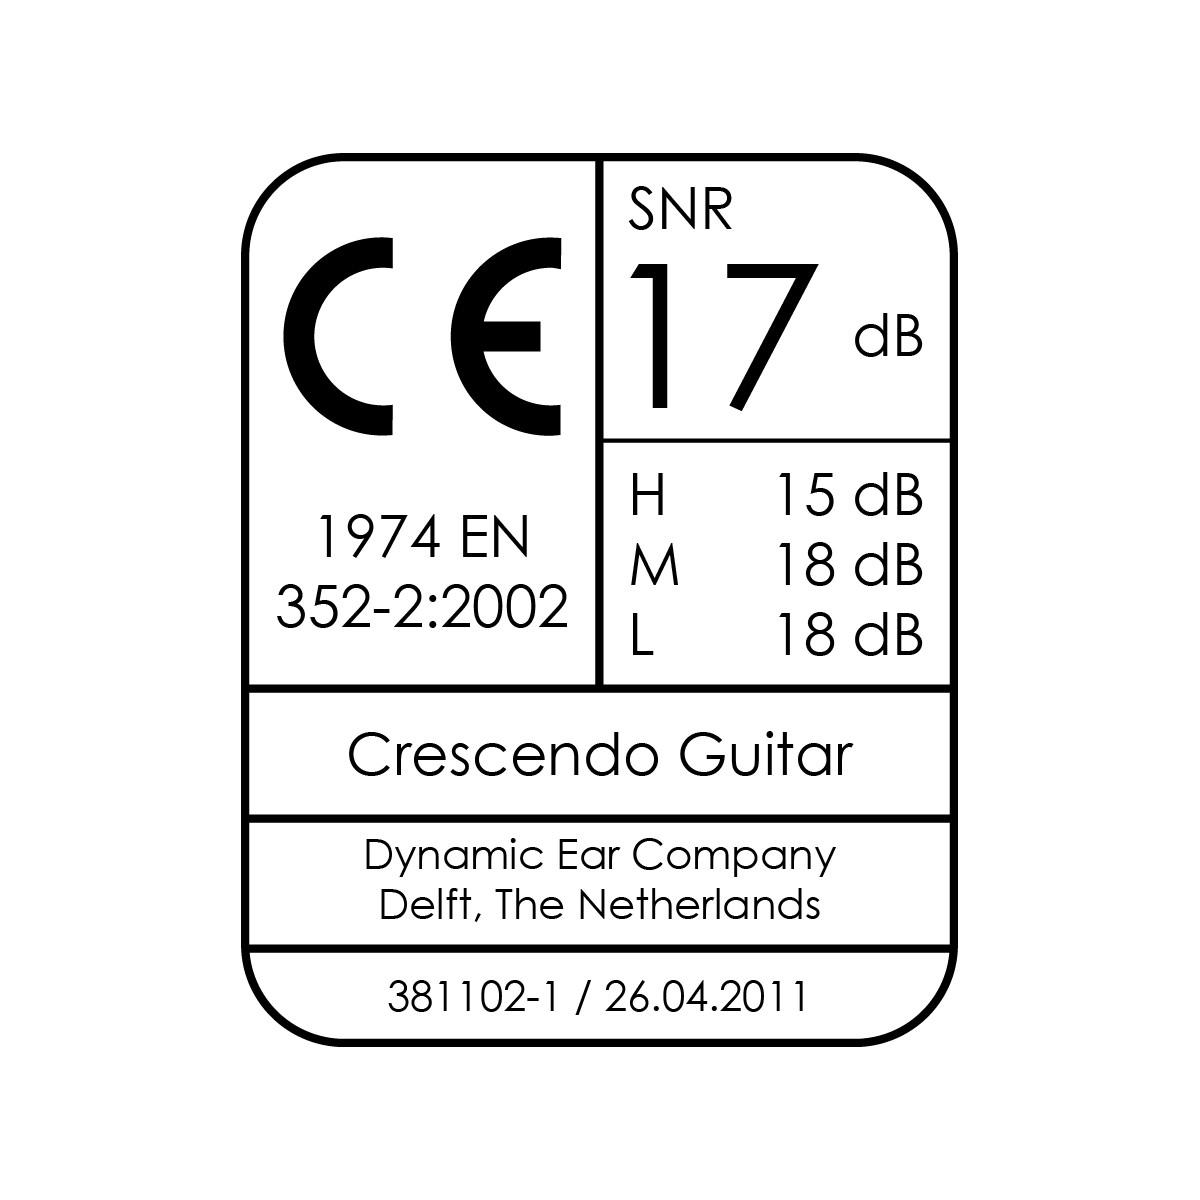 SNR 17dB - Guitar - Protection Auditive spéciale Guitare